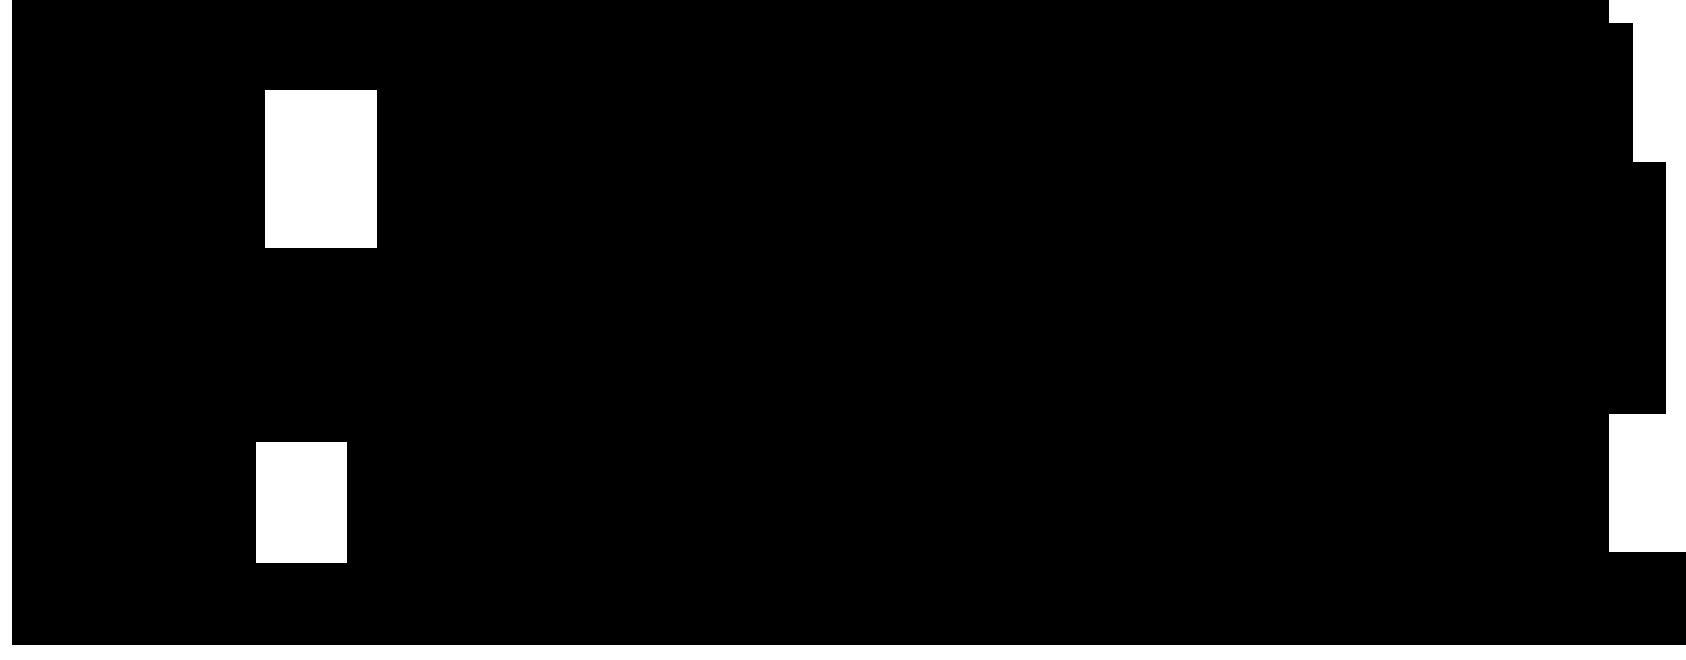 Line Drawing of the Tiller — 17'